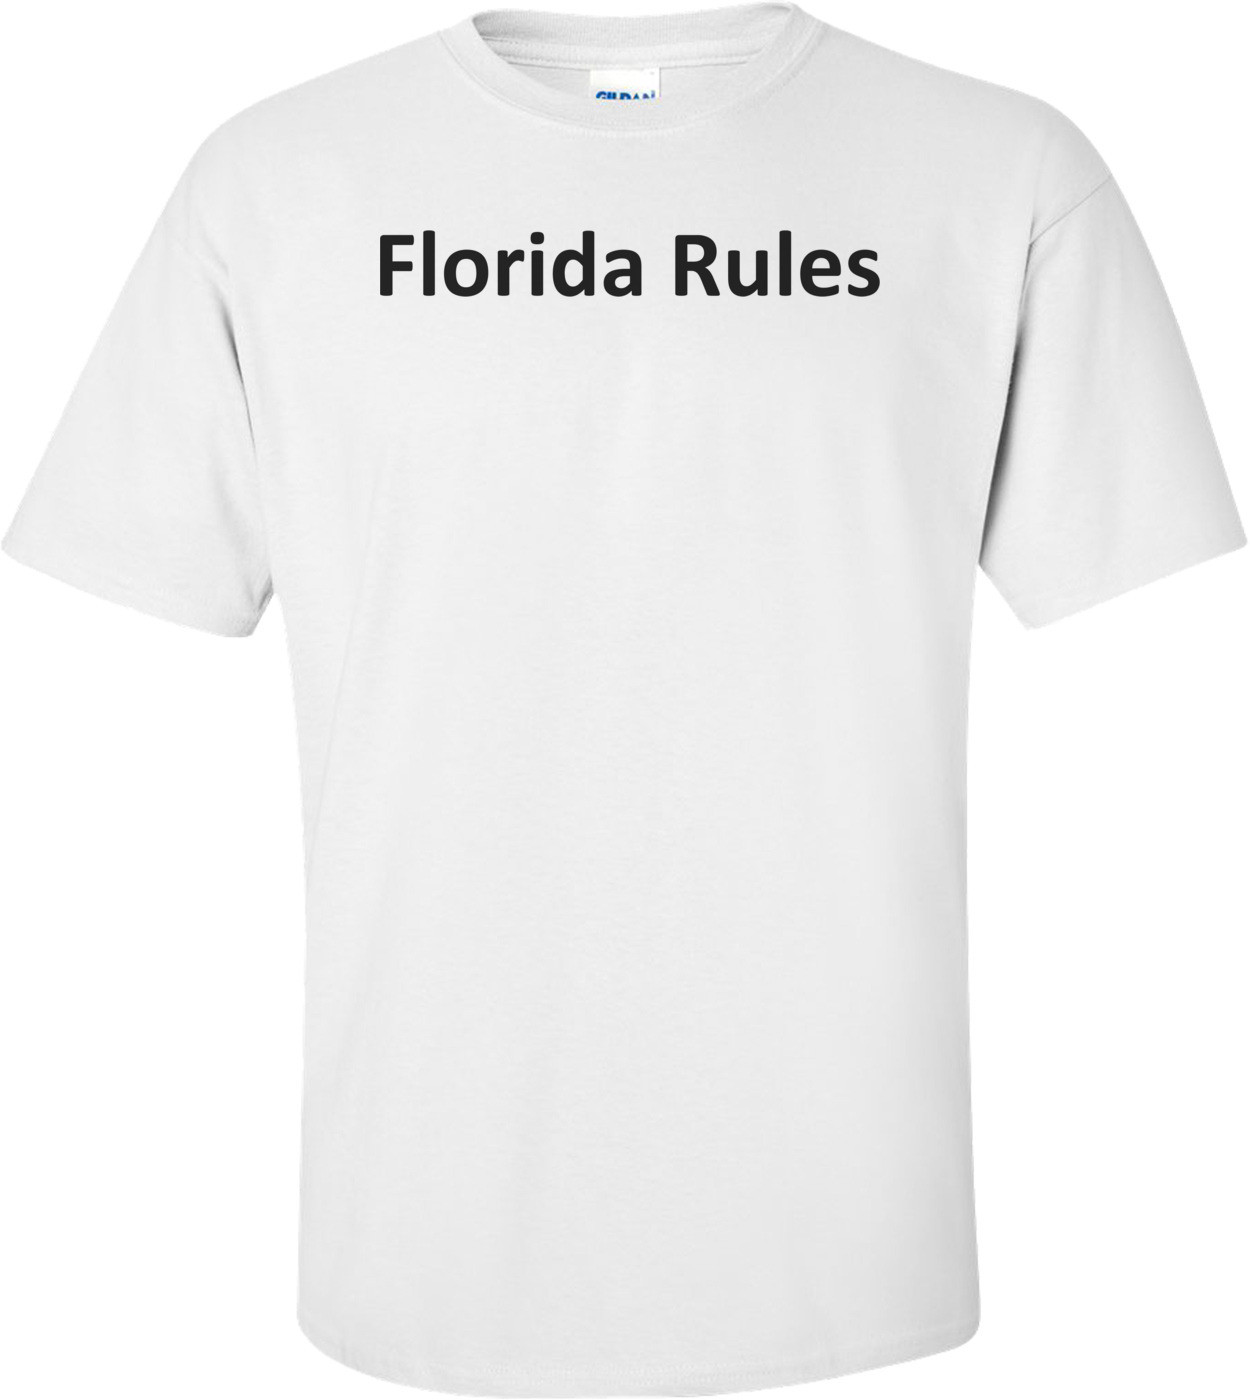 Florida Rules T-Shirt